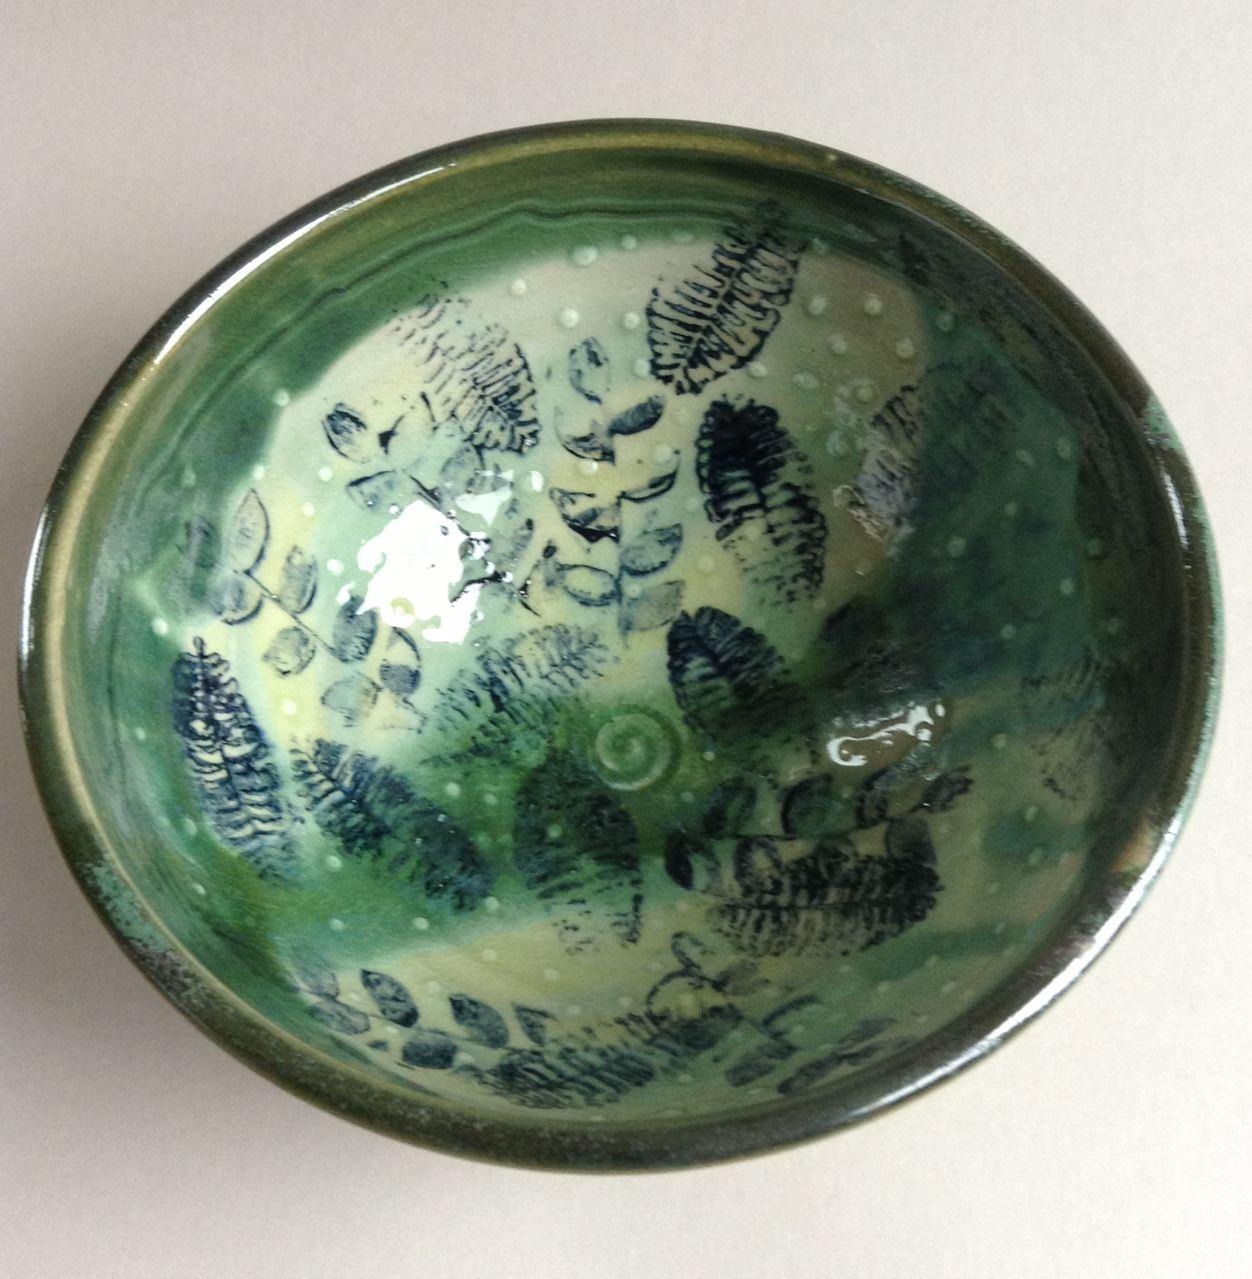 stoneware bowl in green